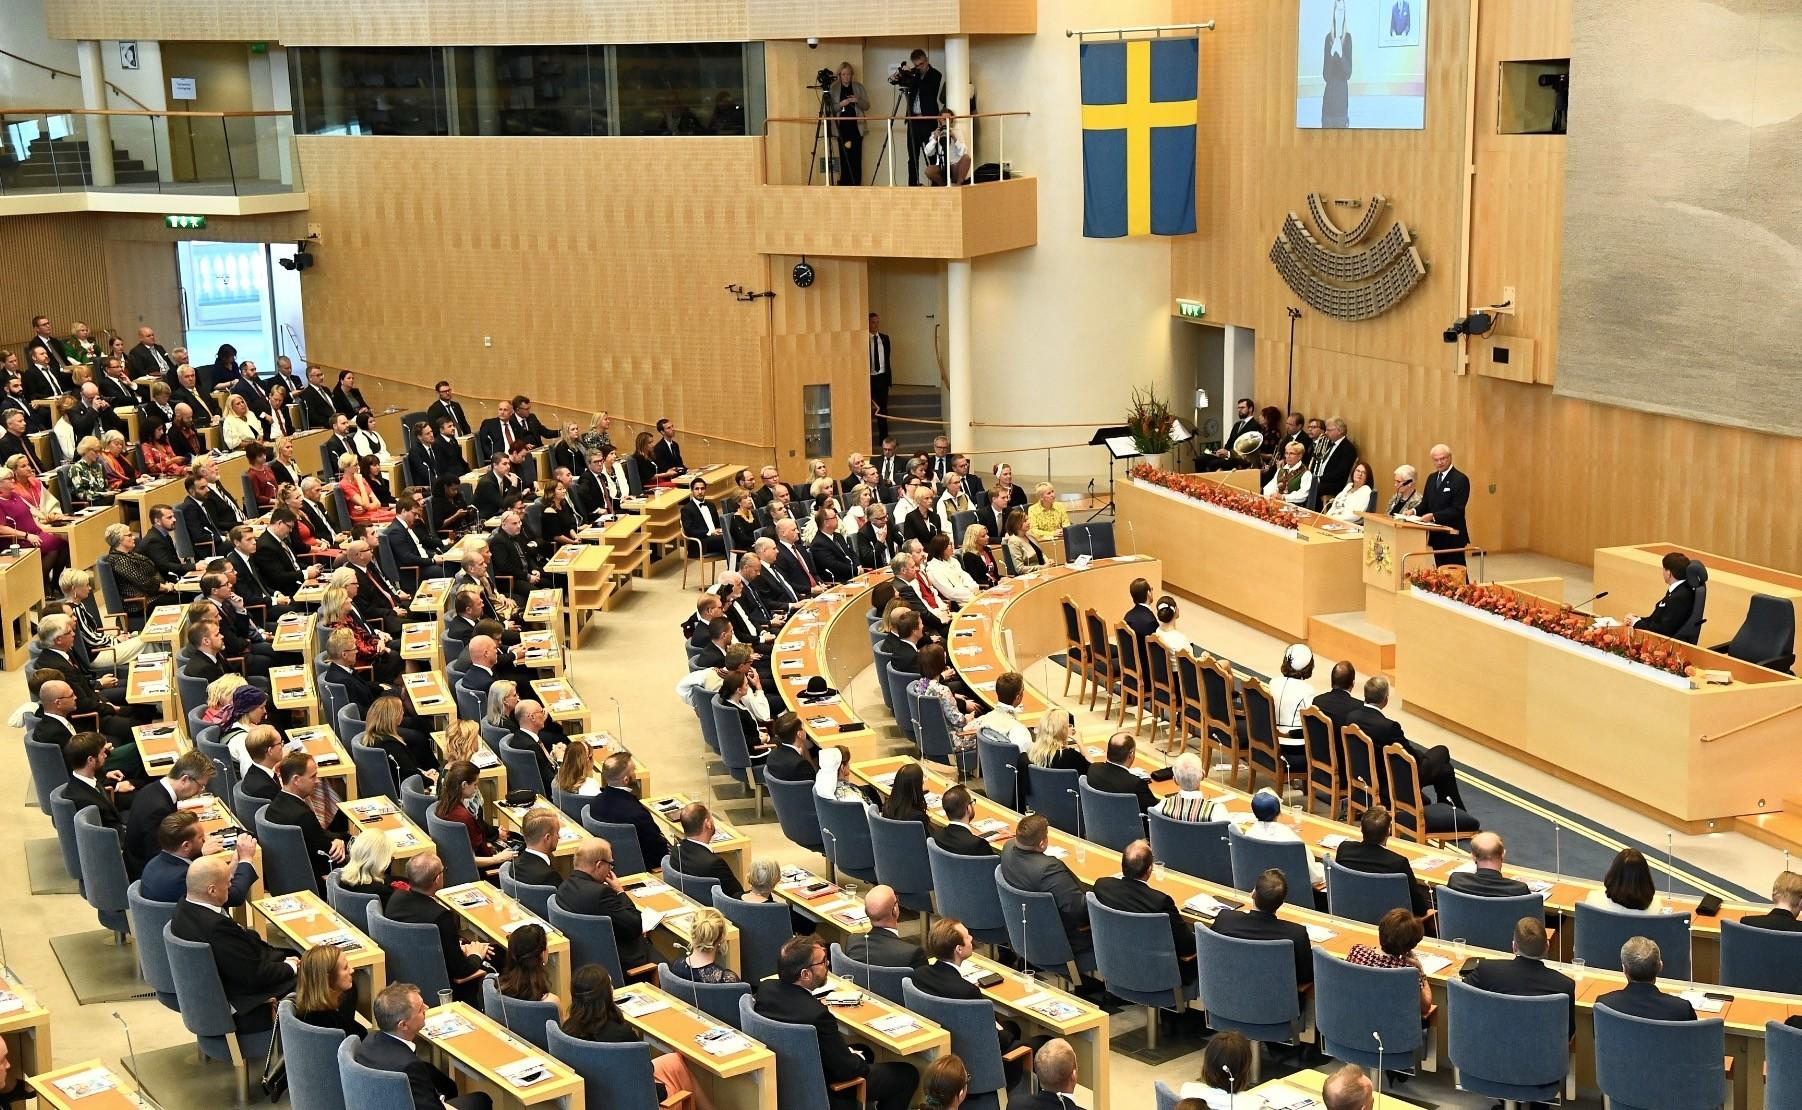 Swedenu2019s King Carl Gustaf speaks during the opening of parliament, Stockholm, Sept. 25.